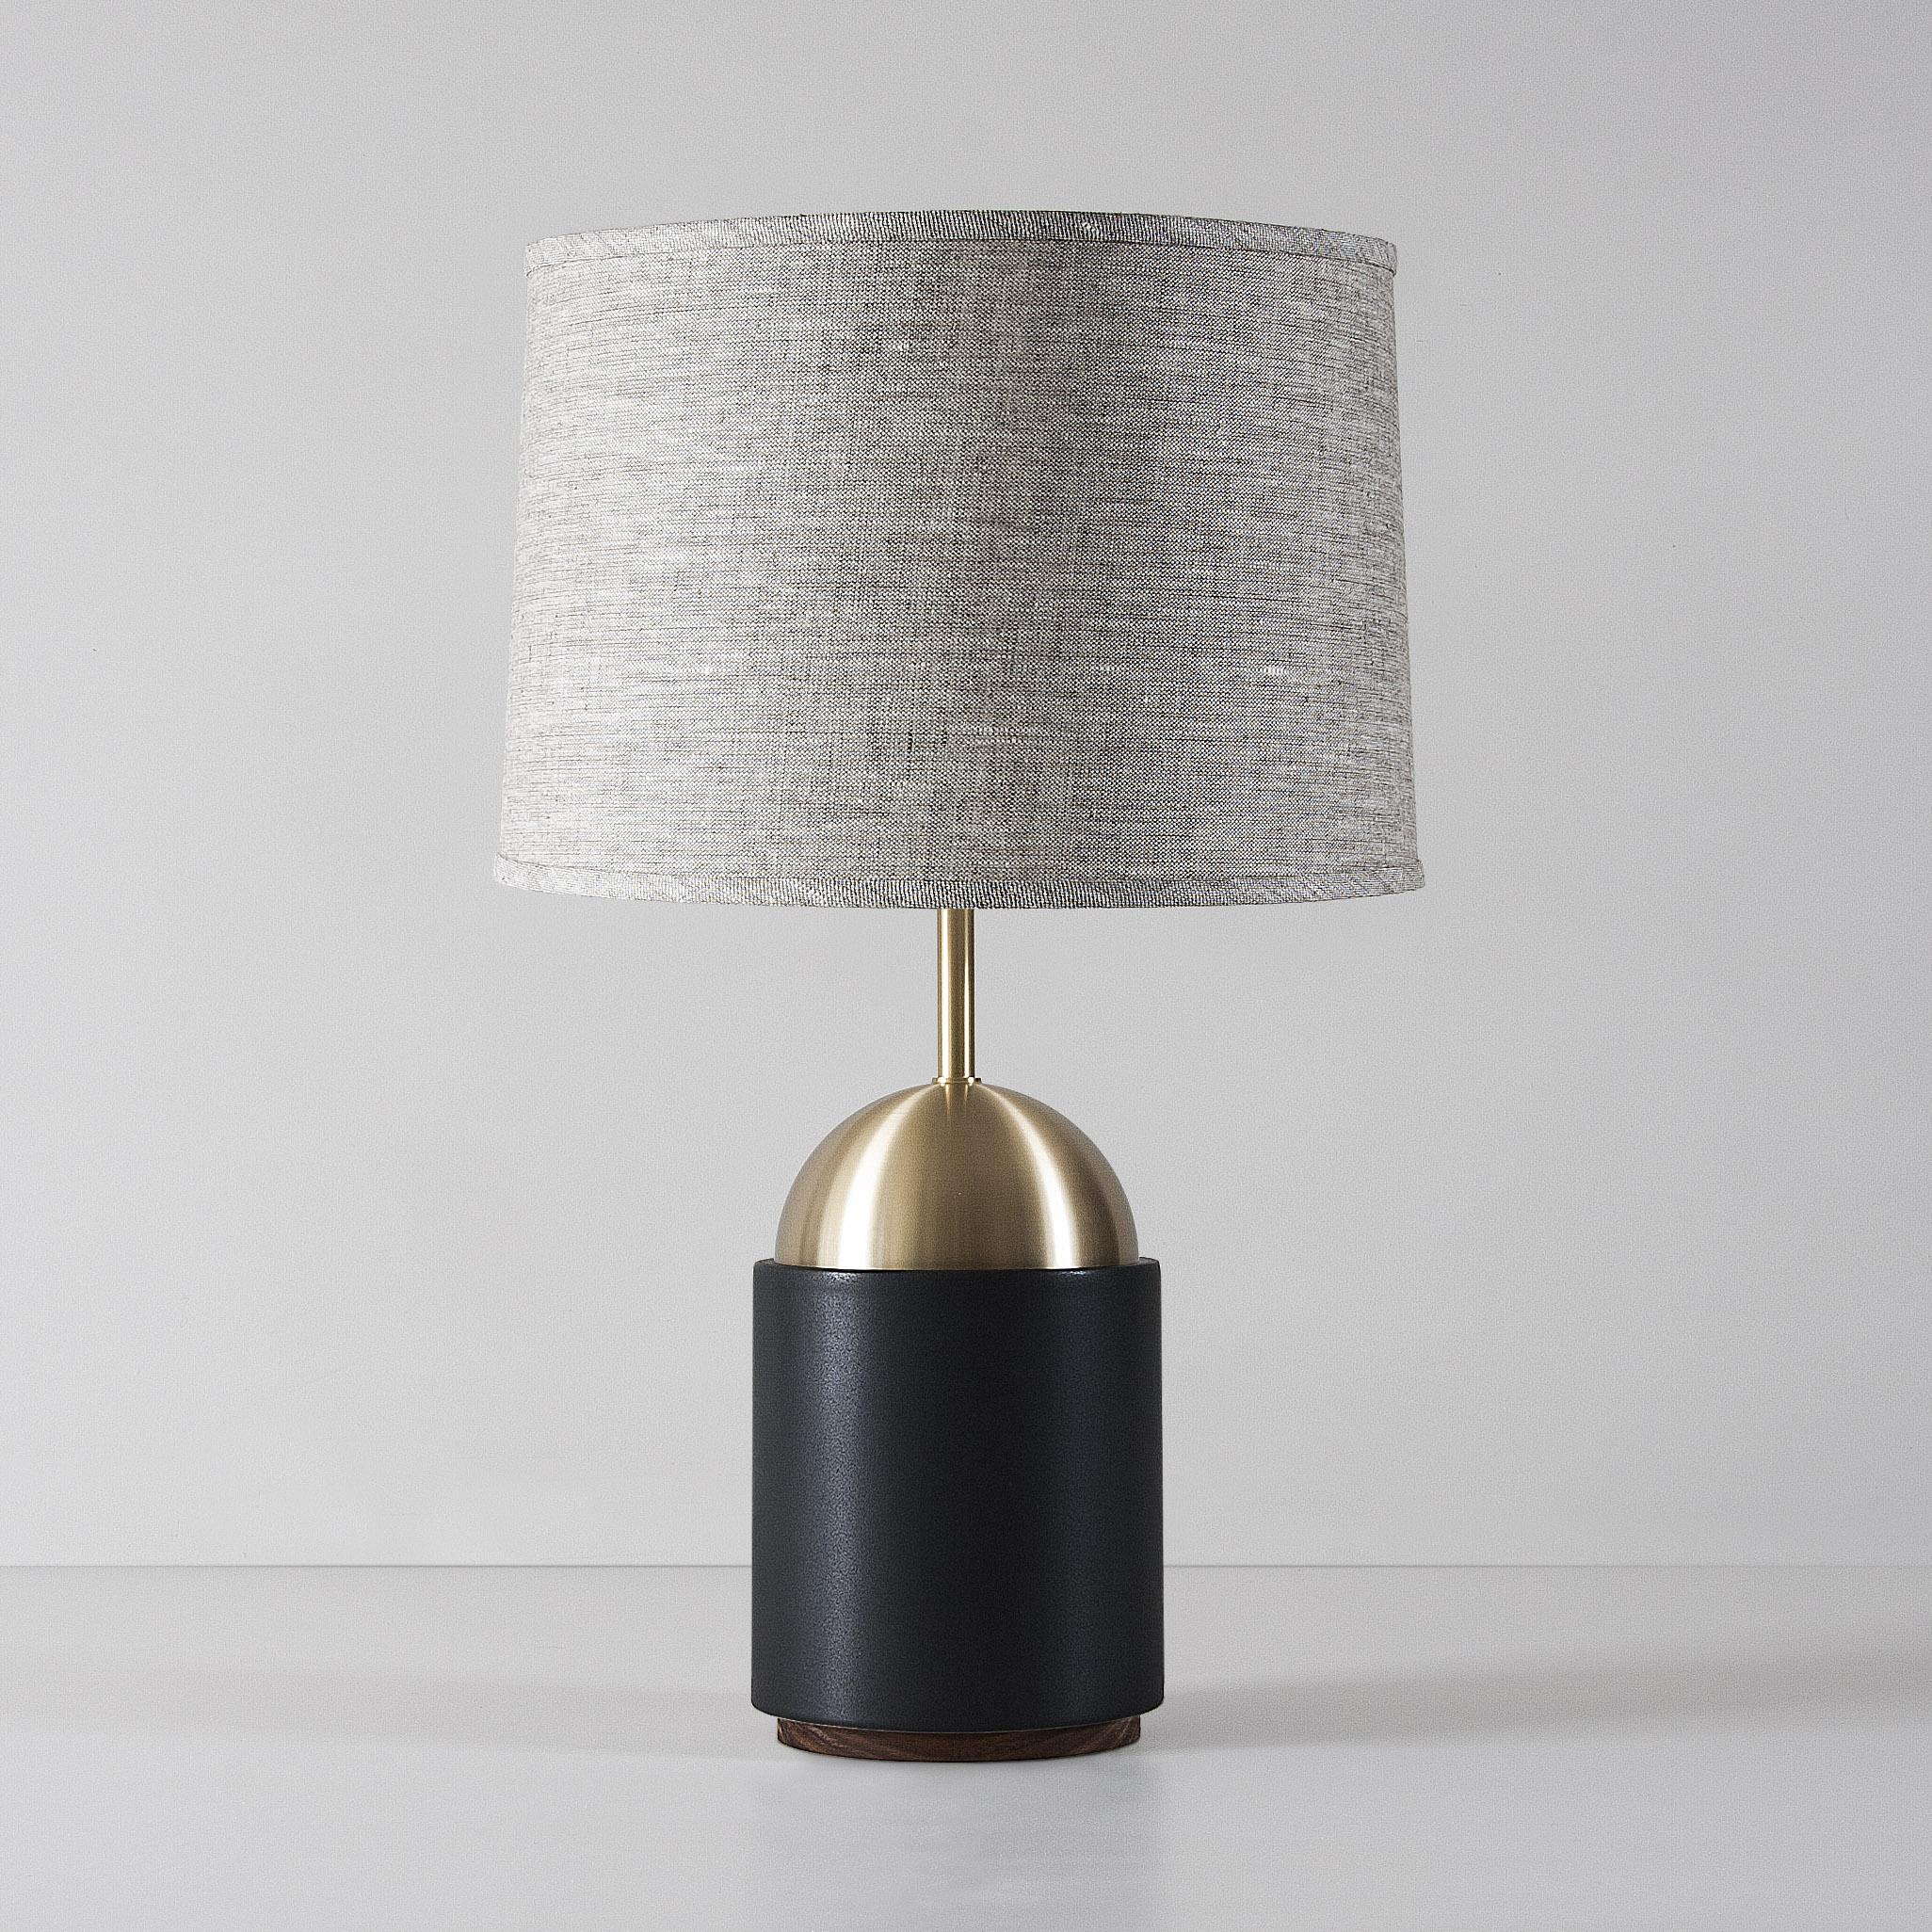 Stone and Sawyer lamp